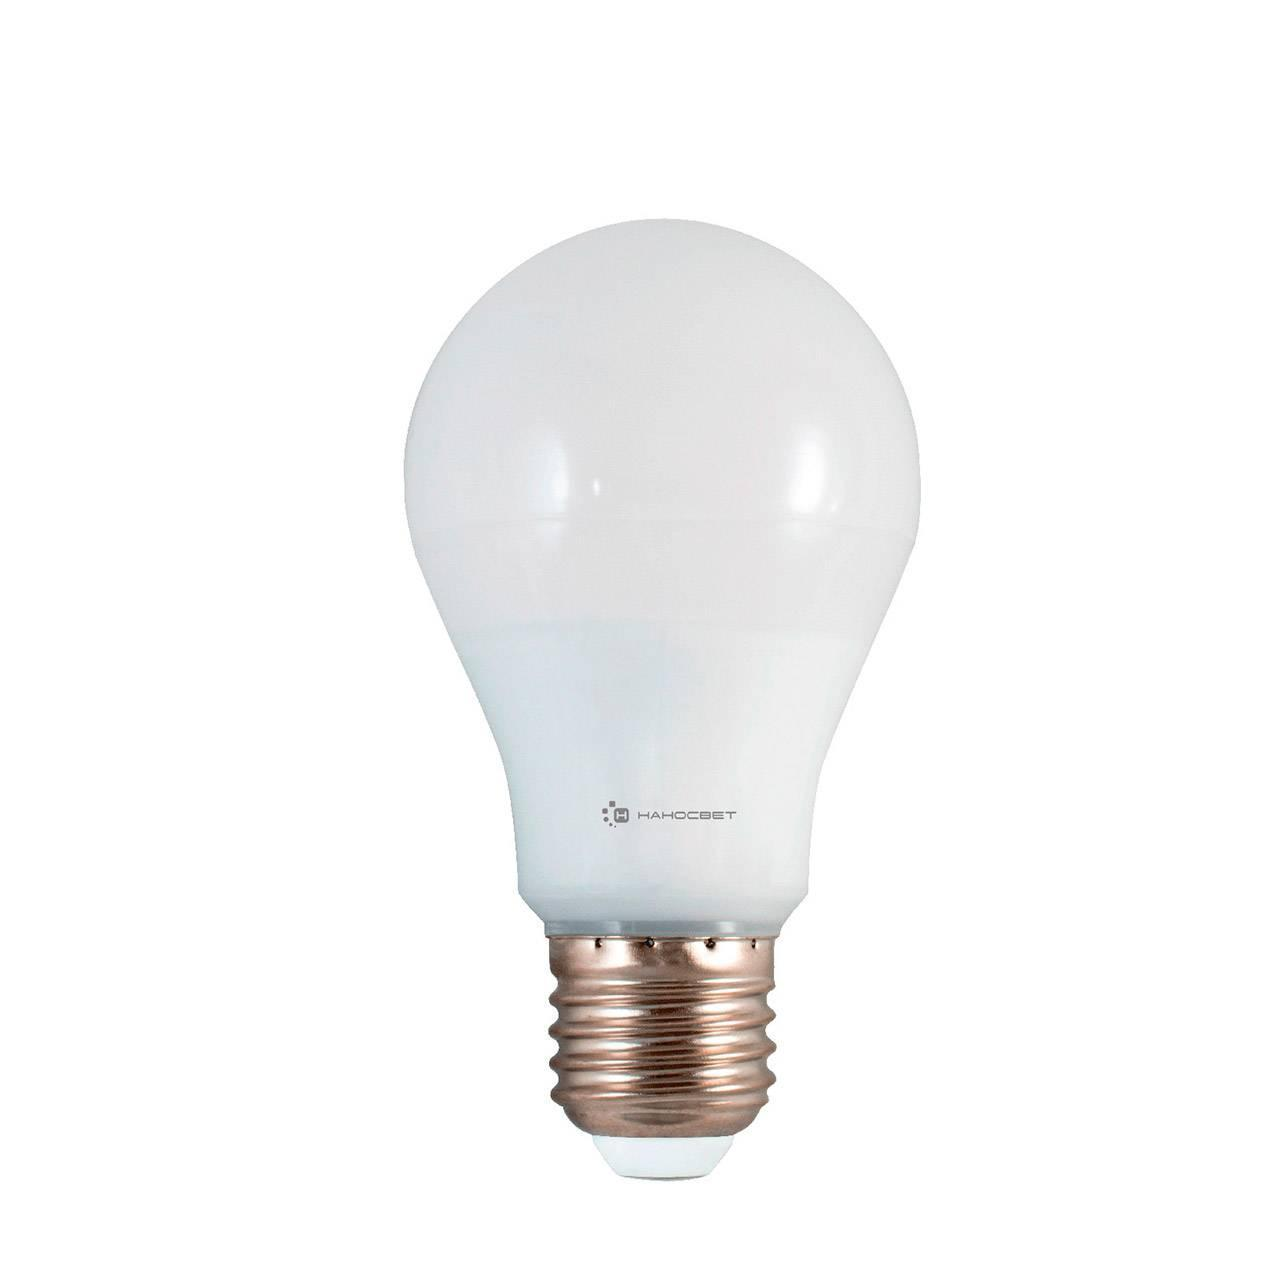 Лампа светодиодная E27 10W 2700K матовая LE-GLS-10/E27/827 L162 лампа светодиодная e27 10w 2700k груша матовая 23210